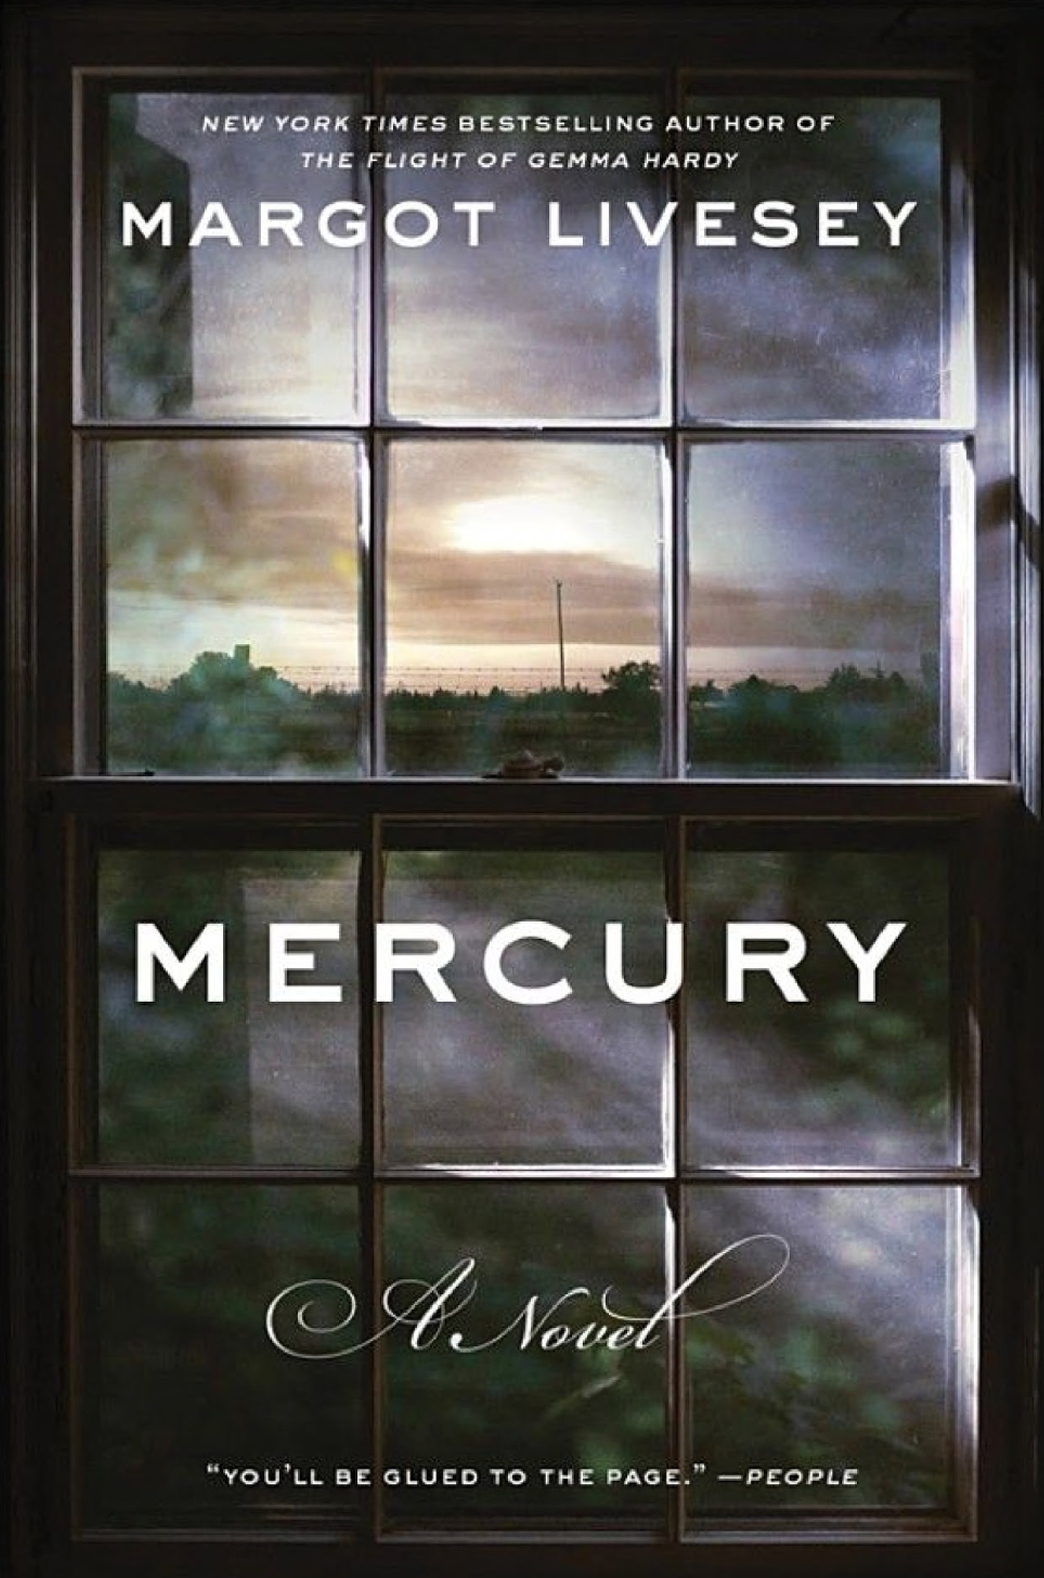 kathleen stone writer booklab literary salon mercury margot livesey